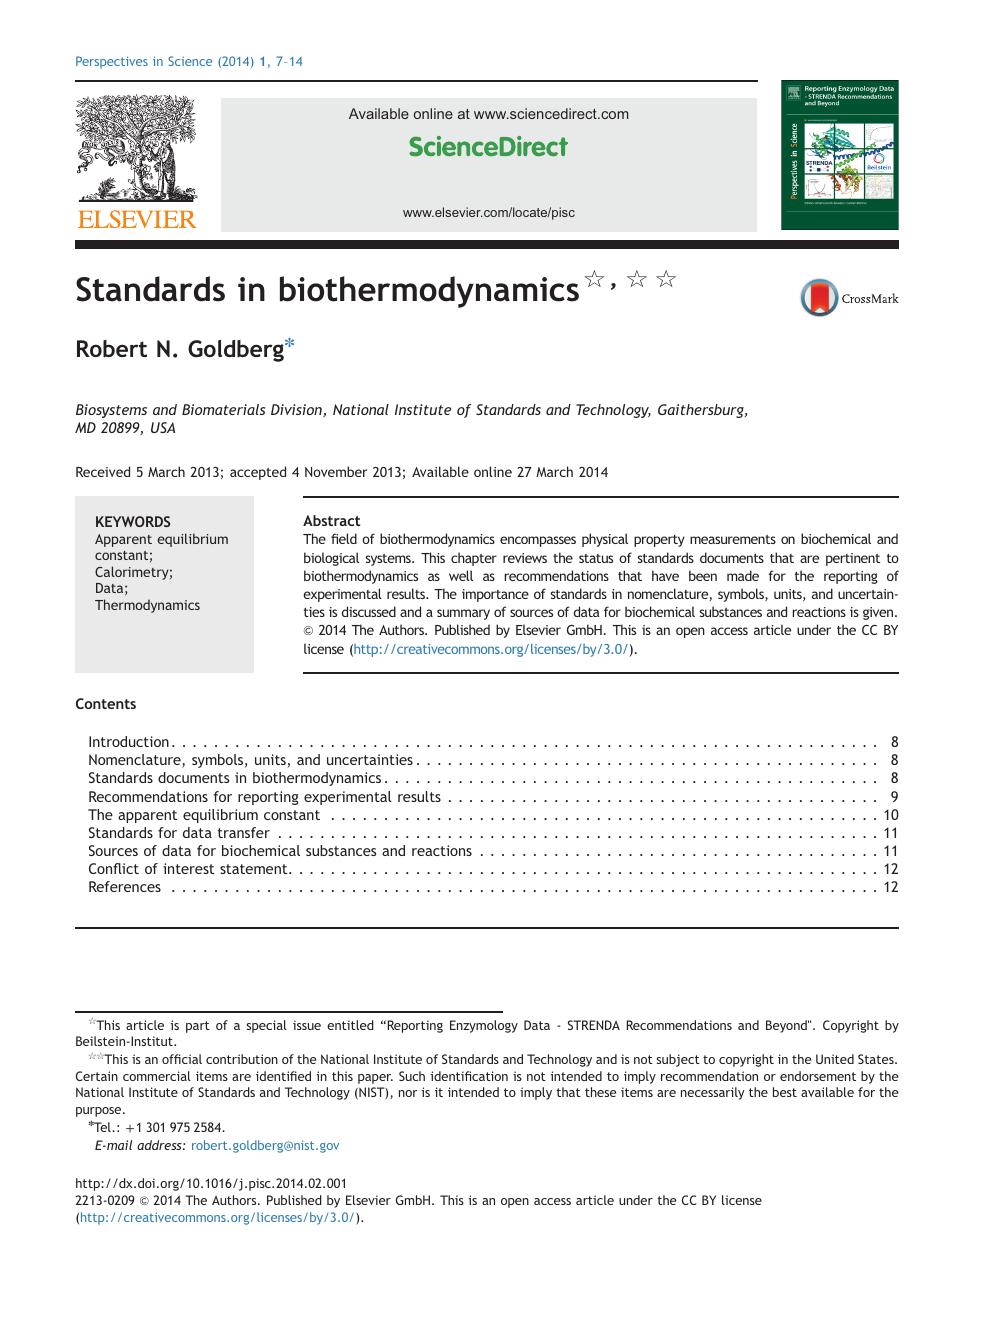 Biothermodynamics, Part 1